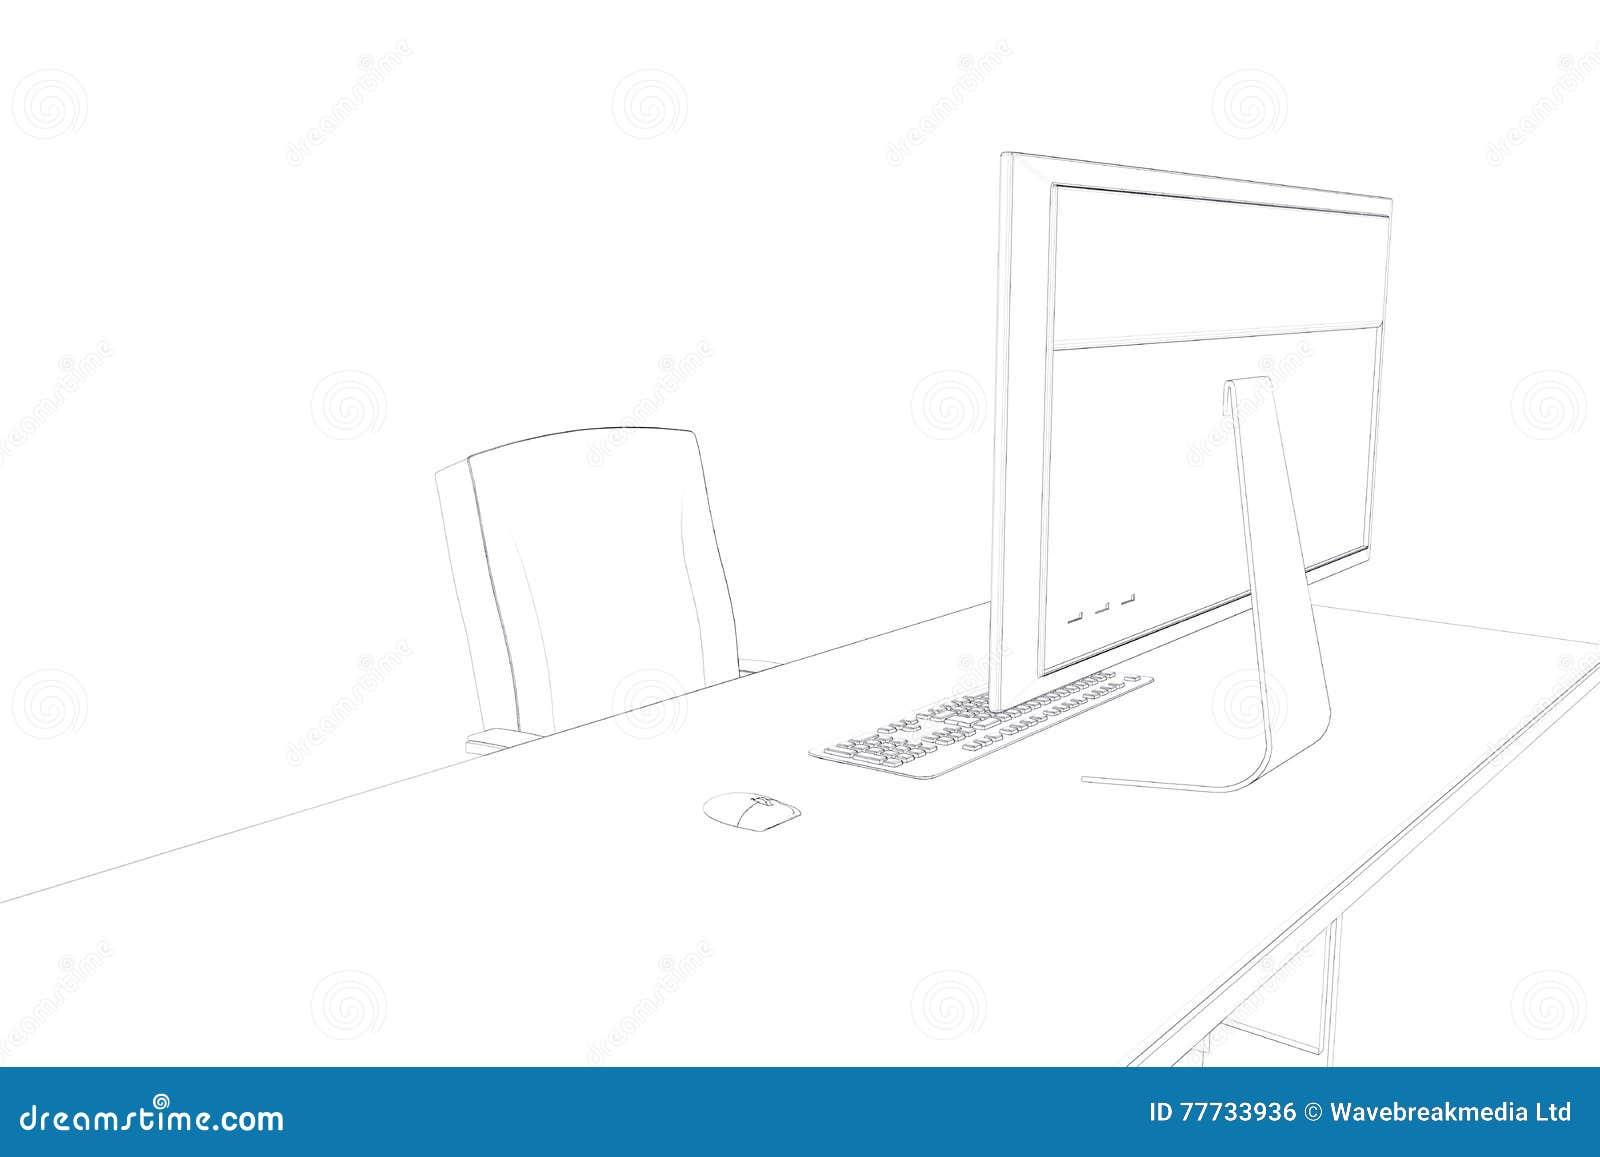 Draw Of A Desk Stock Illustration Illustration Of People 77733936